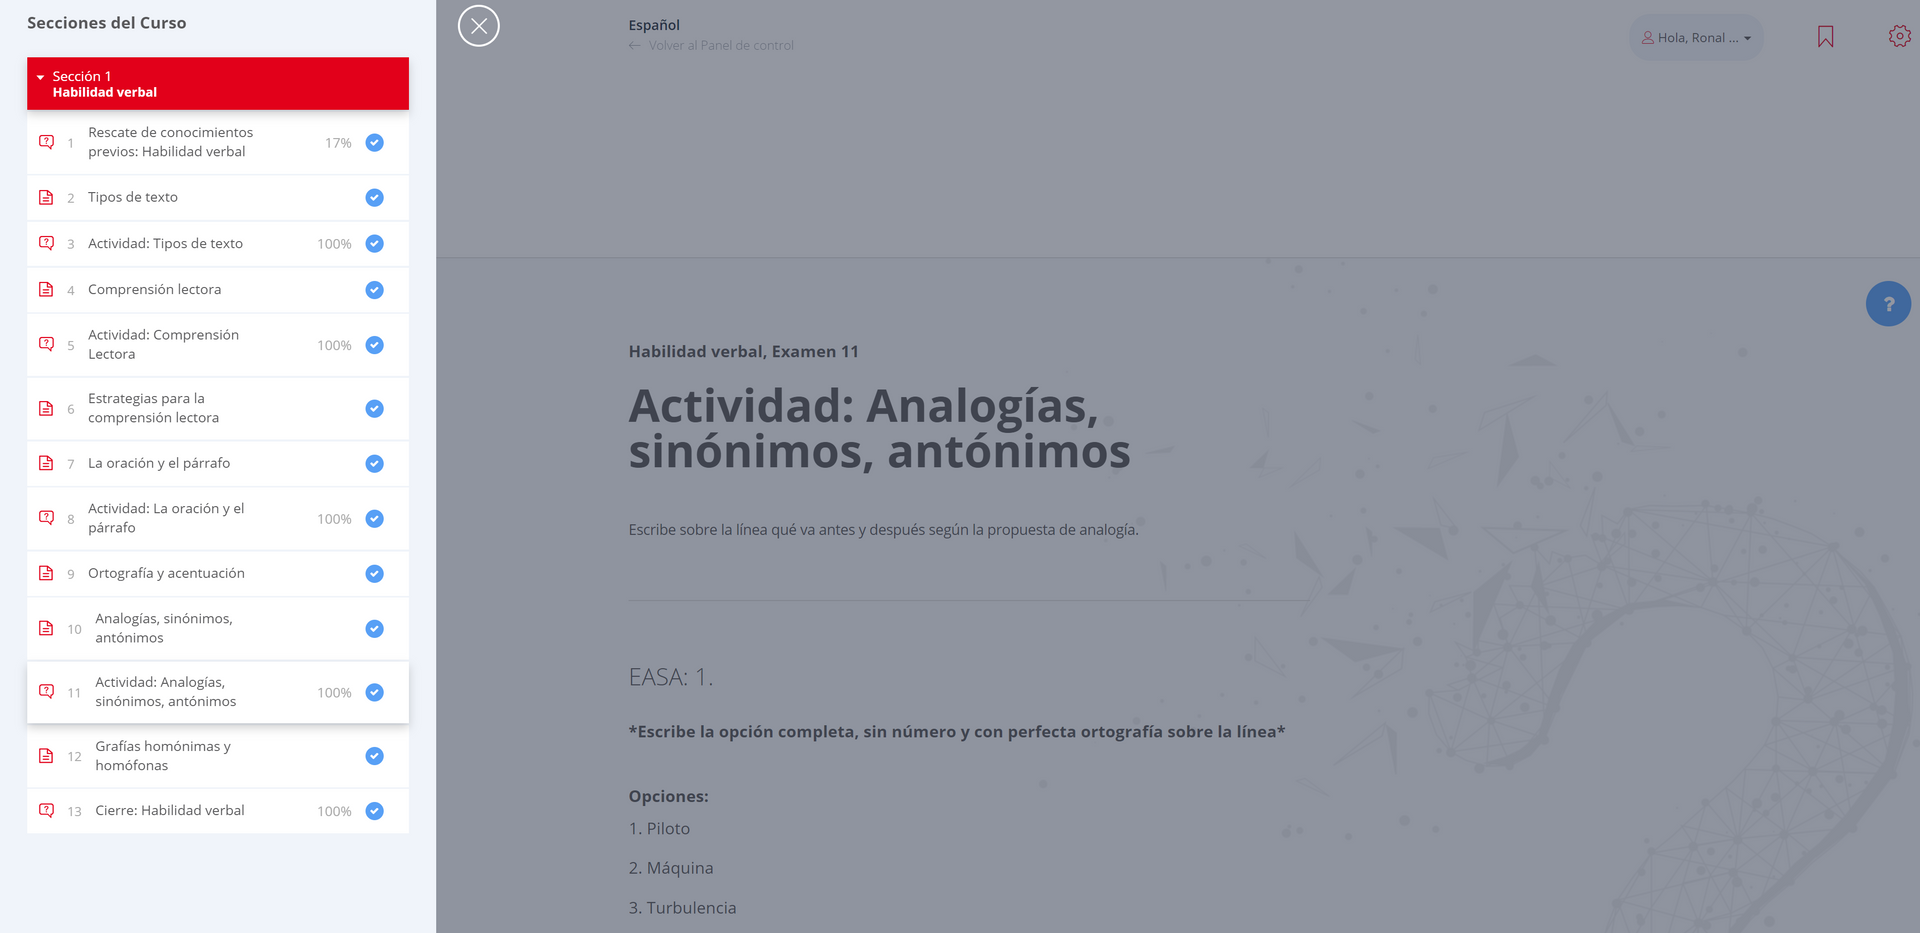 screencapture-edigital-ml-courses-espano